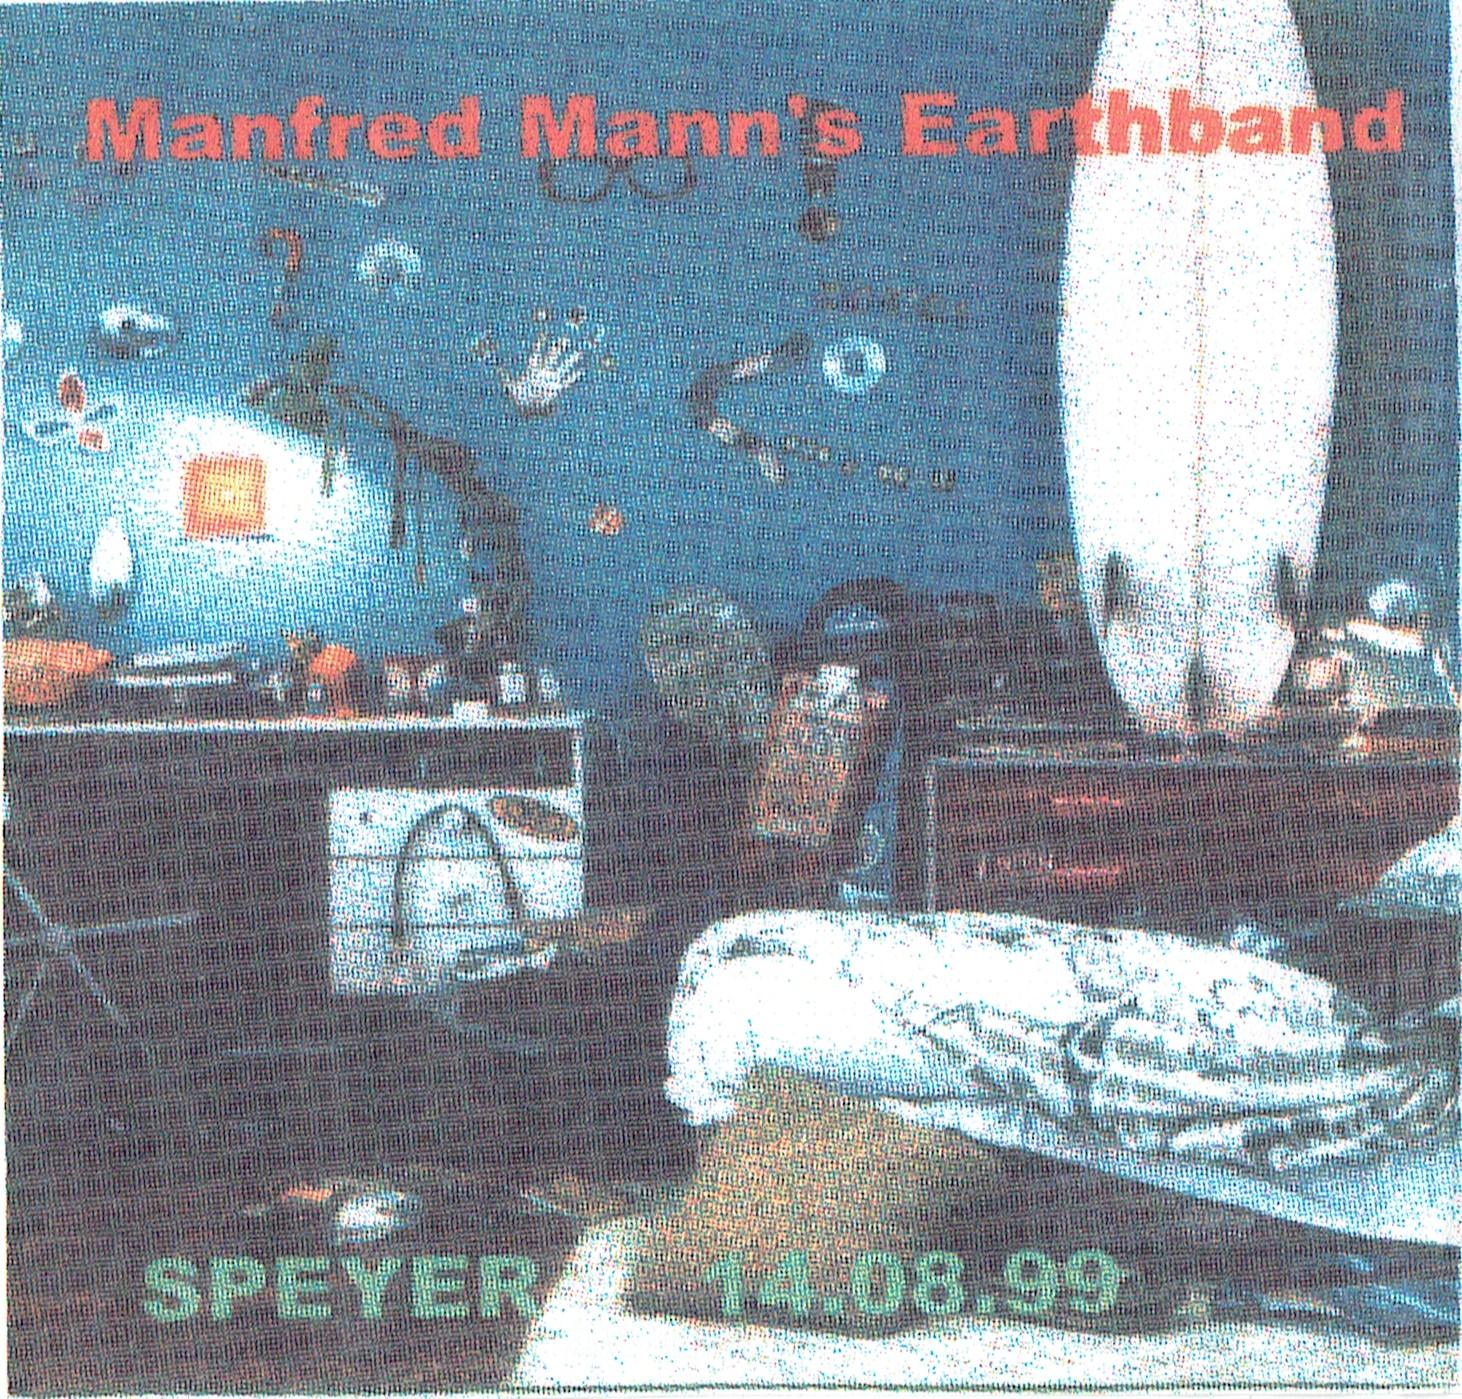 ManfredMannsEarthband1999-08-14HalleSpeyerGermany.jpg